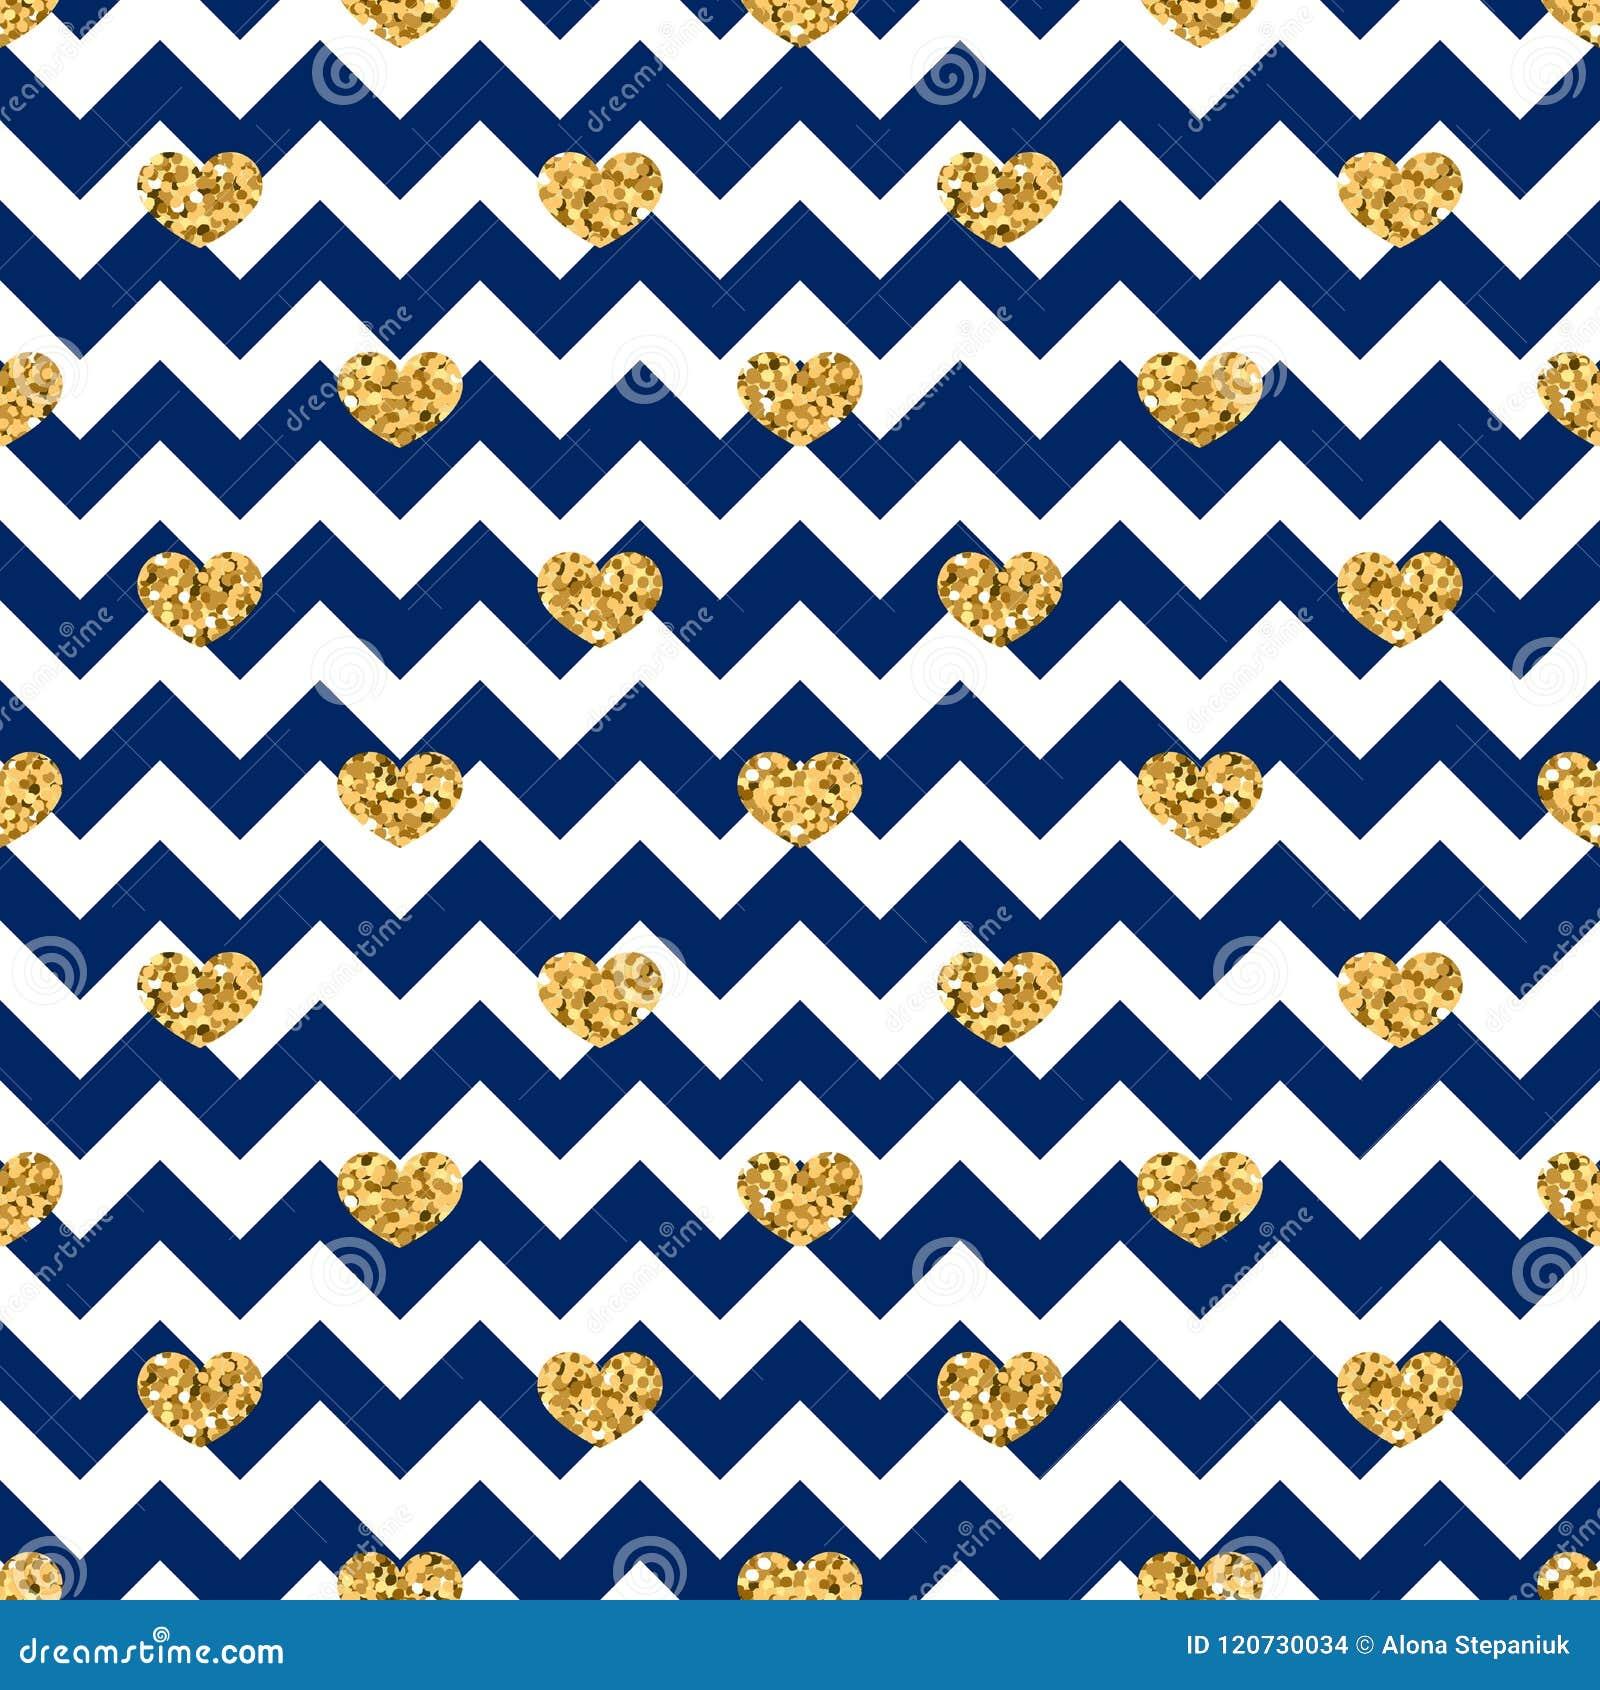 Gold Heart Seamless Pattern Blue White Geometric Zig Zag Golden